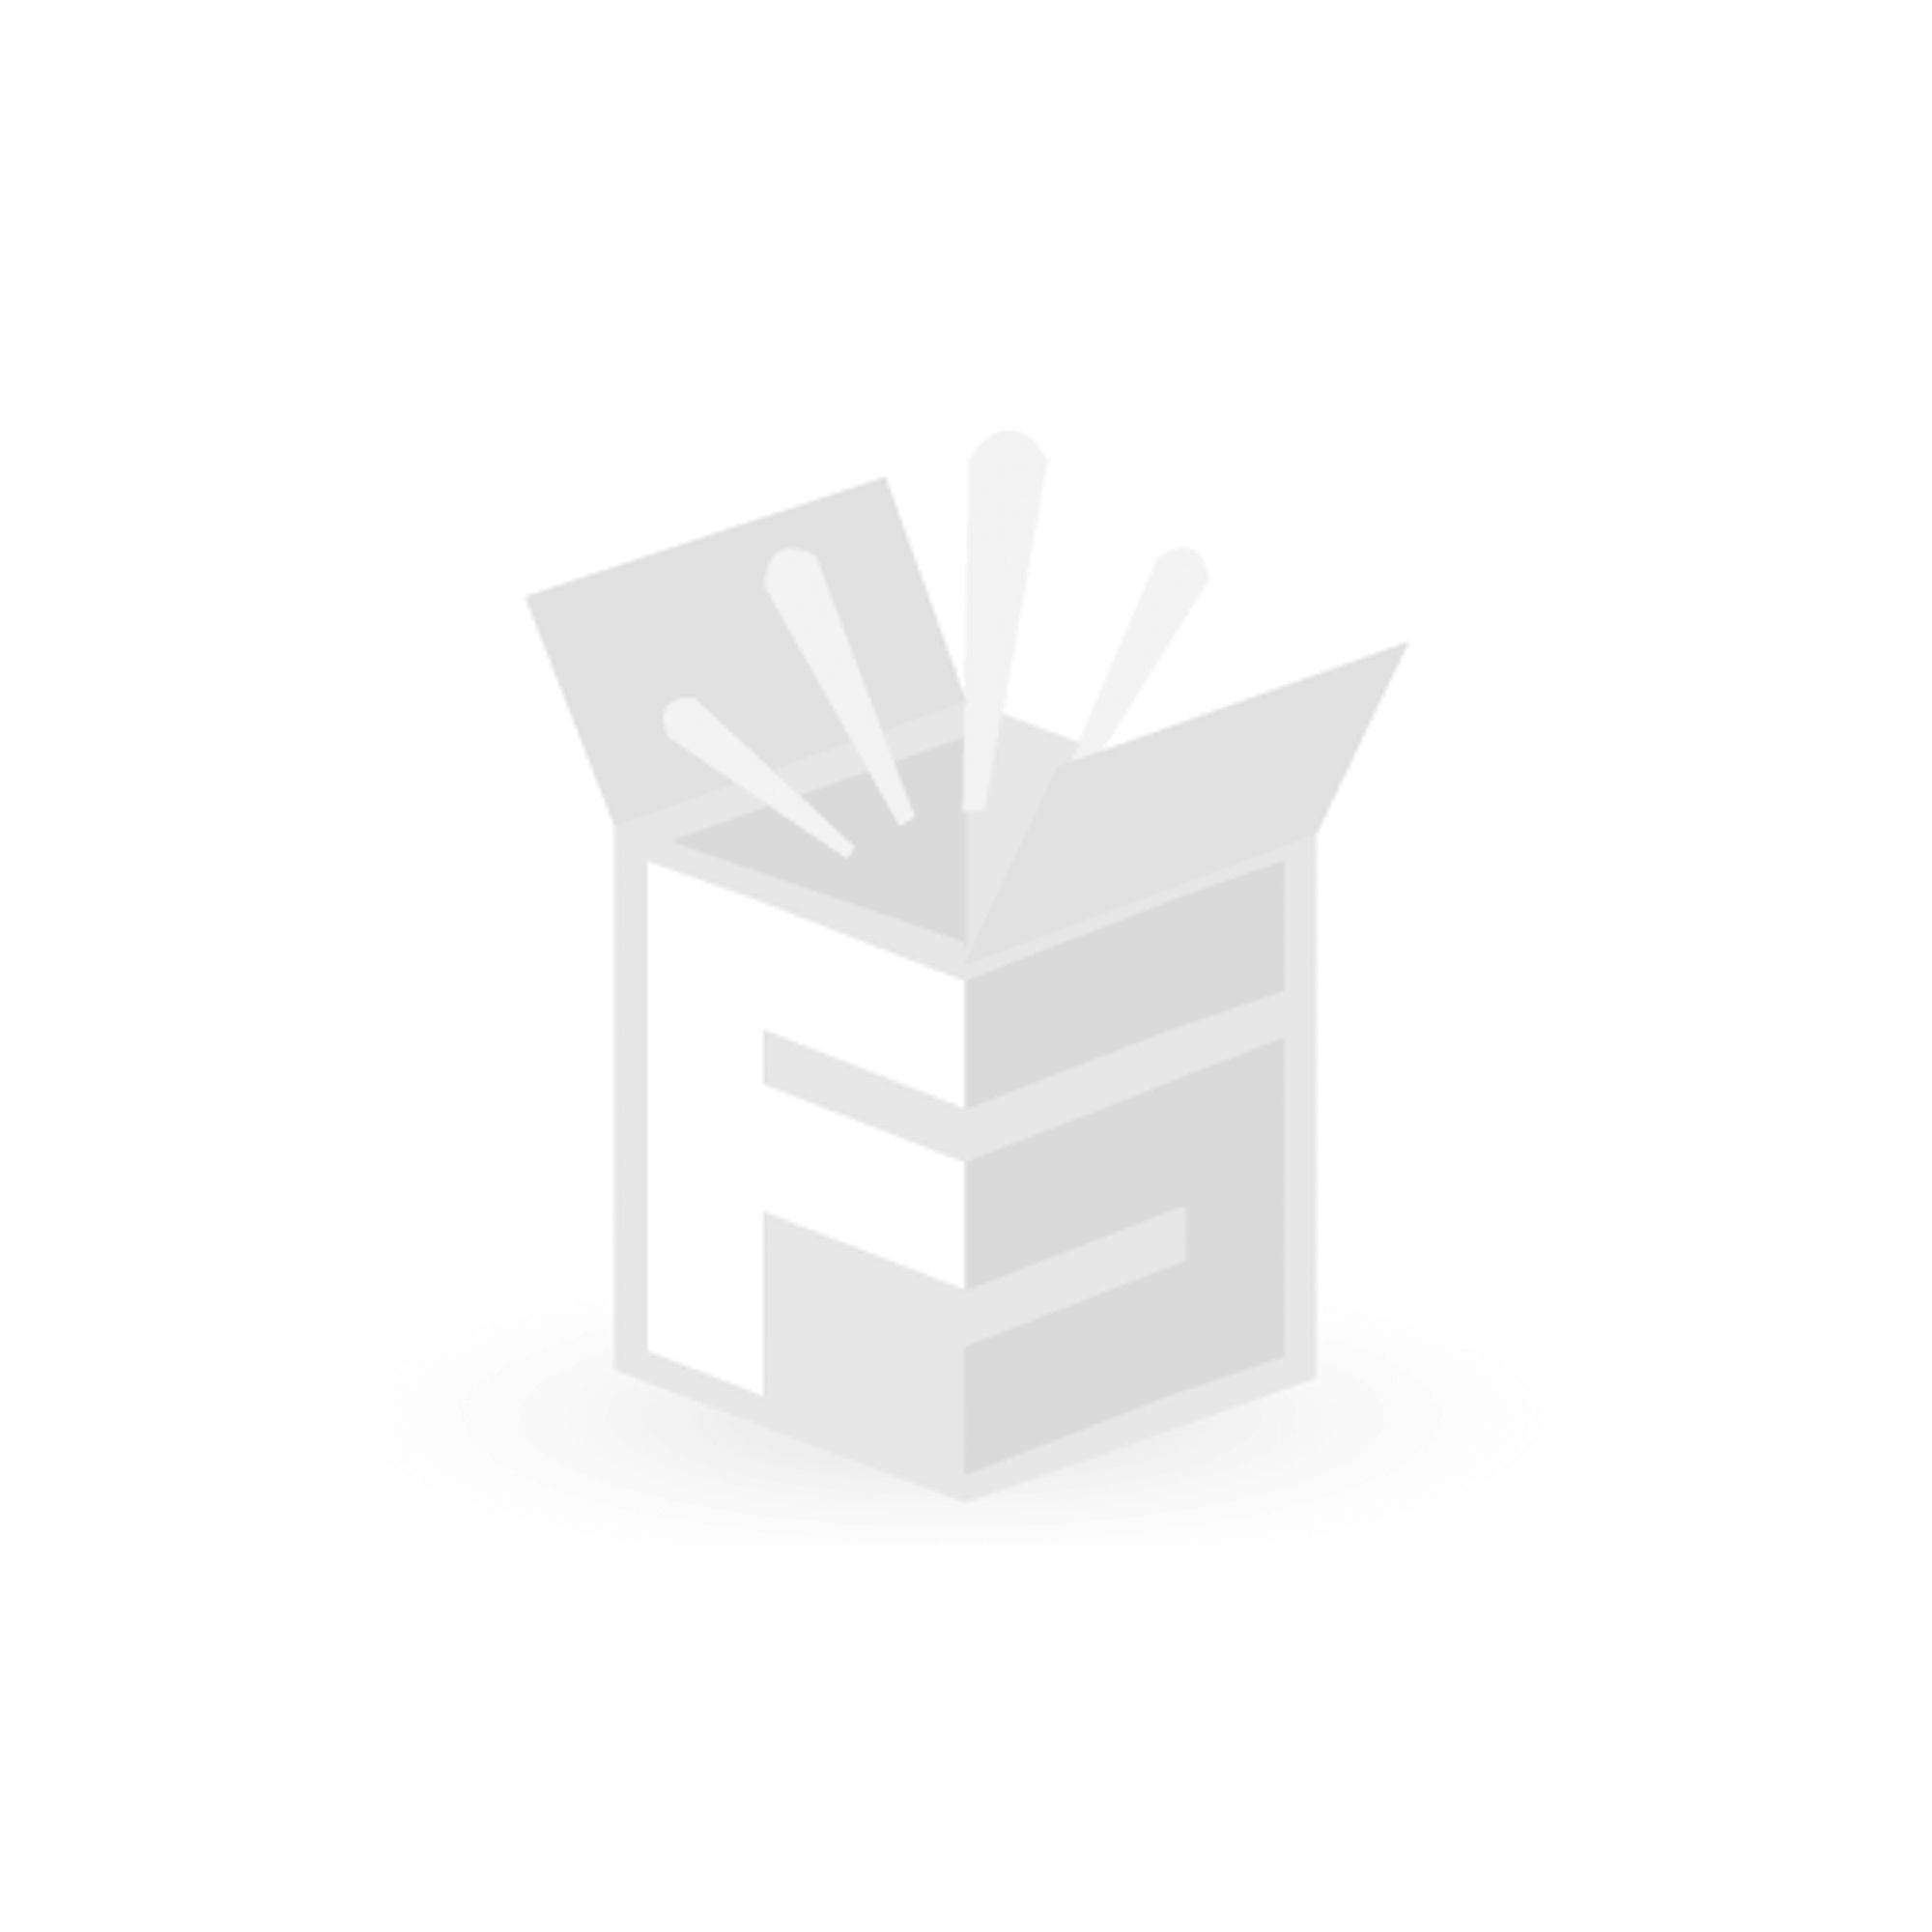 Forsberg LED Flex 360° Bau-Leuchte + eingebaute Steckdose T13